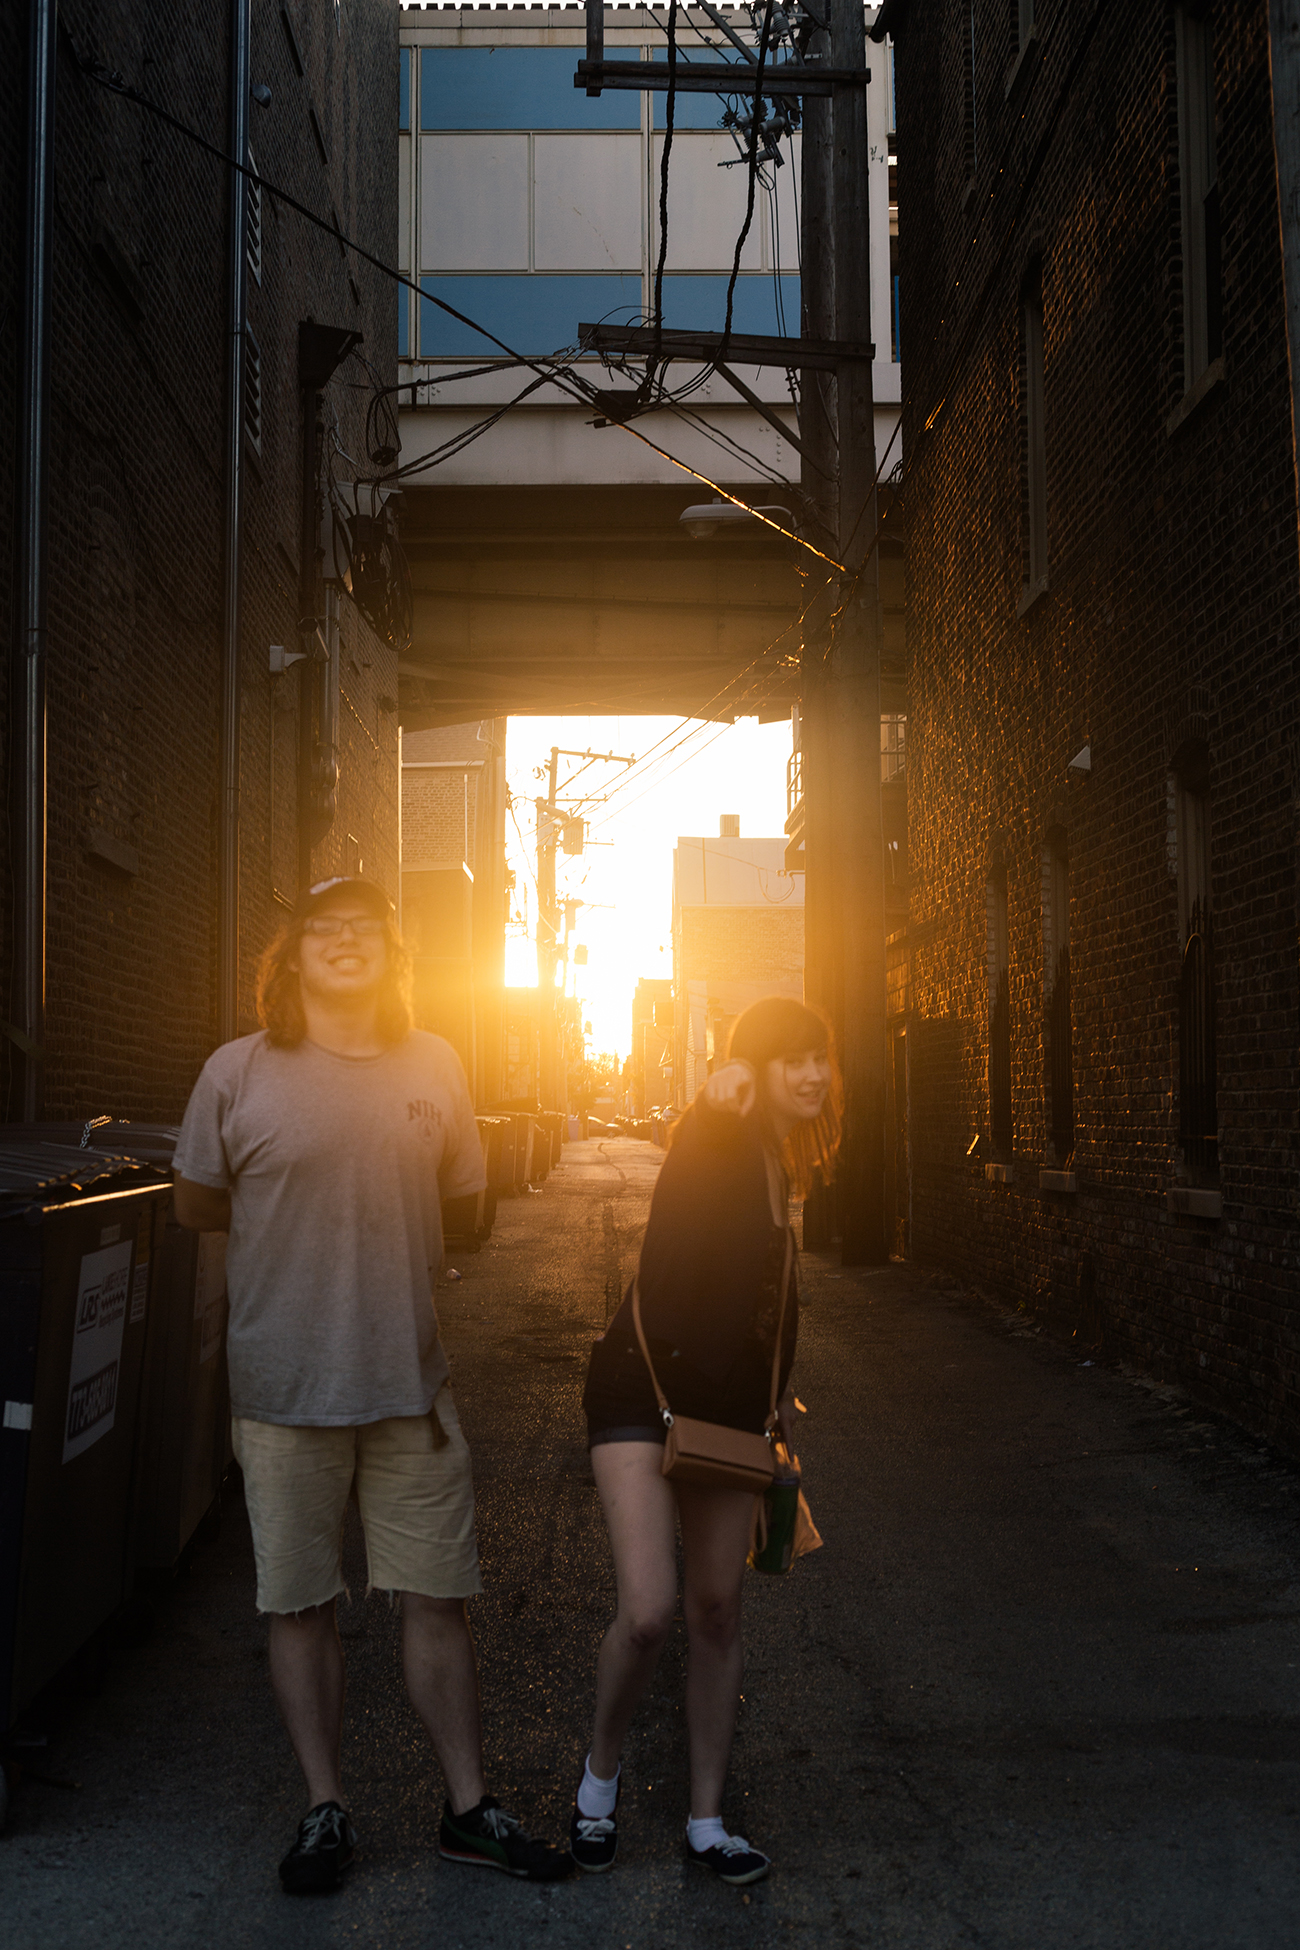 Aust & Jess in an alley